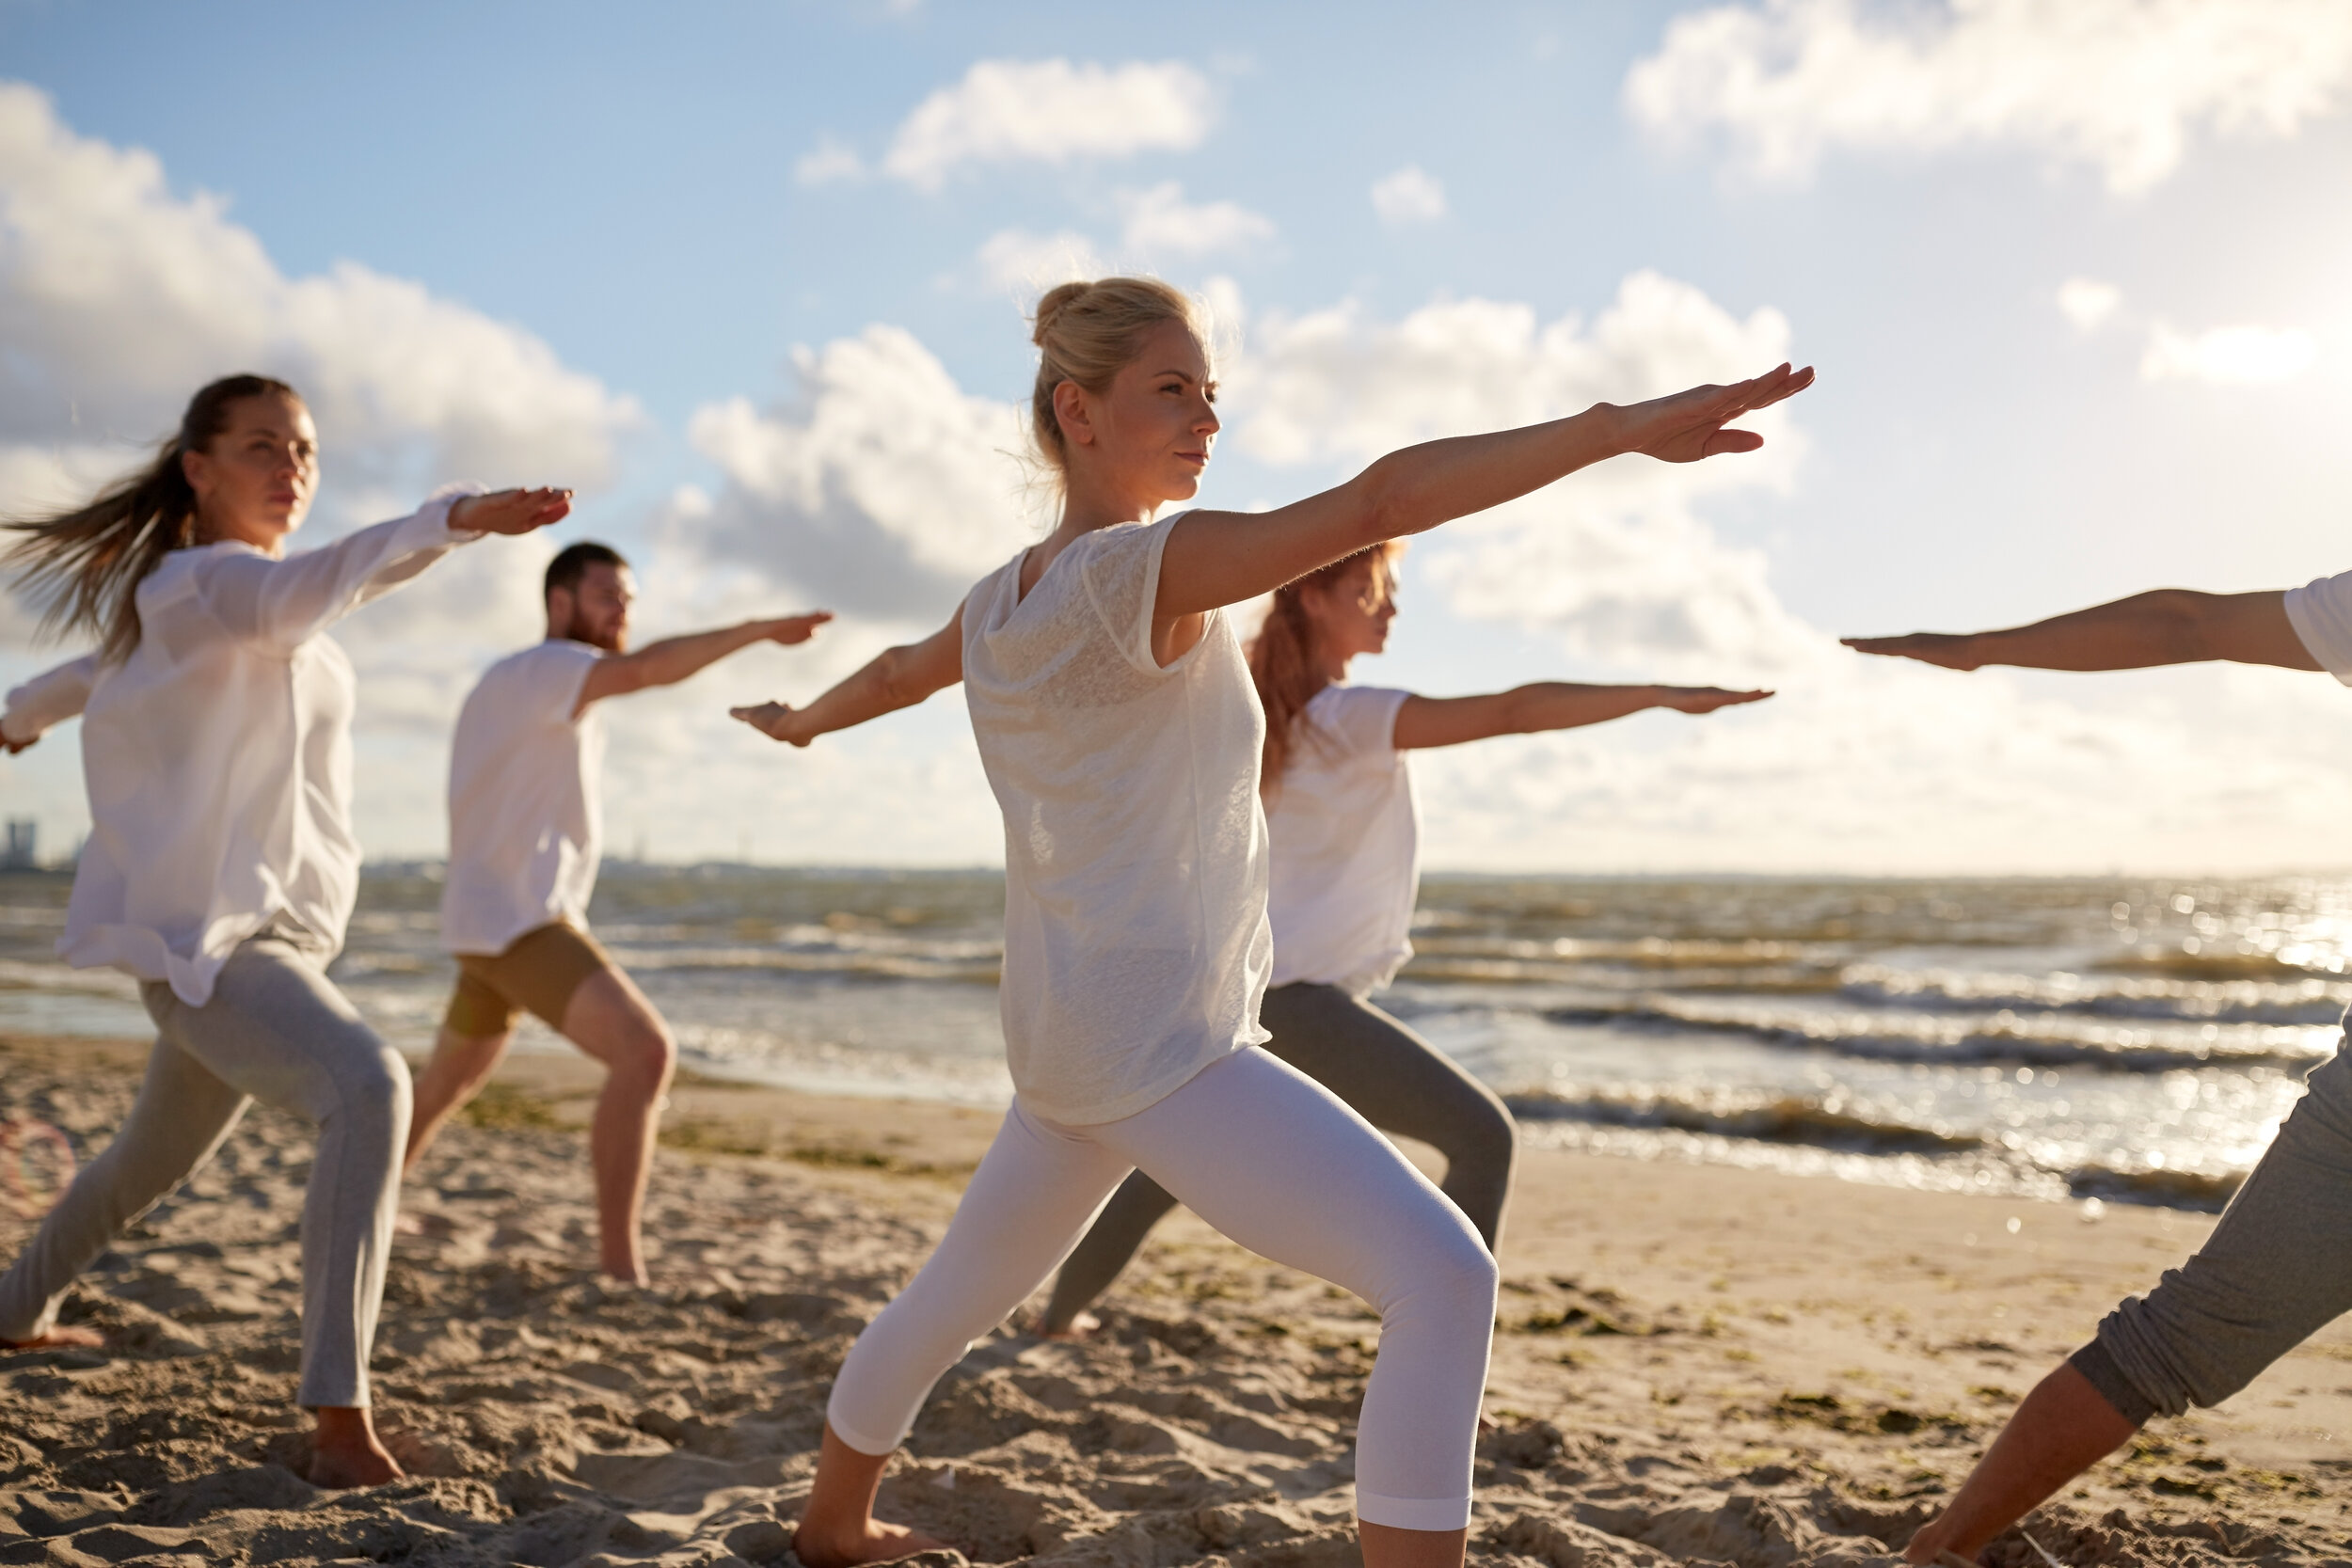 mind, body and soul seekers - renew, nourish, reflect